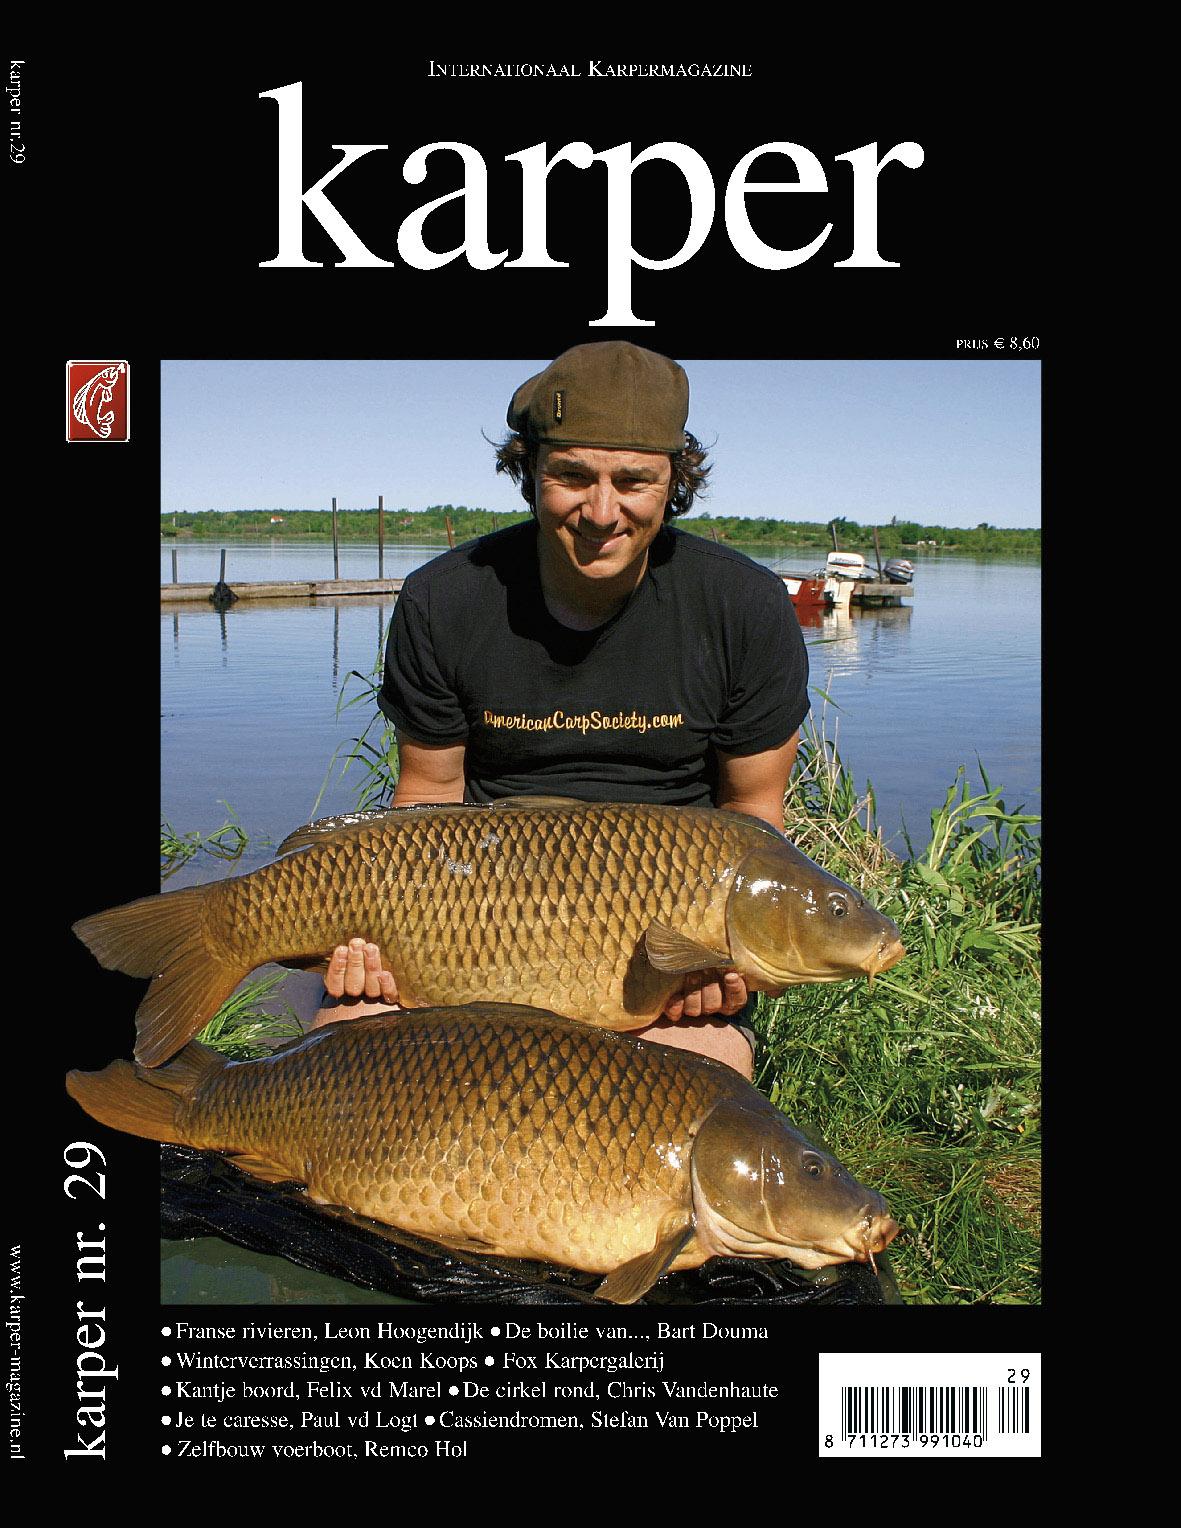 Karper_29 copy.jpg